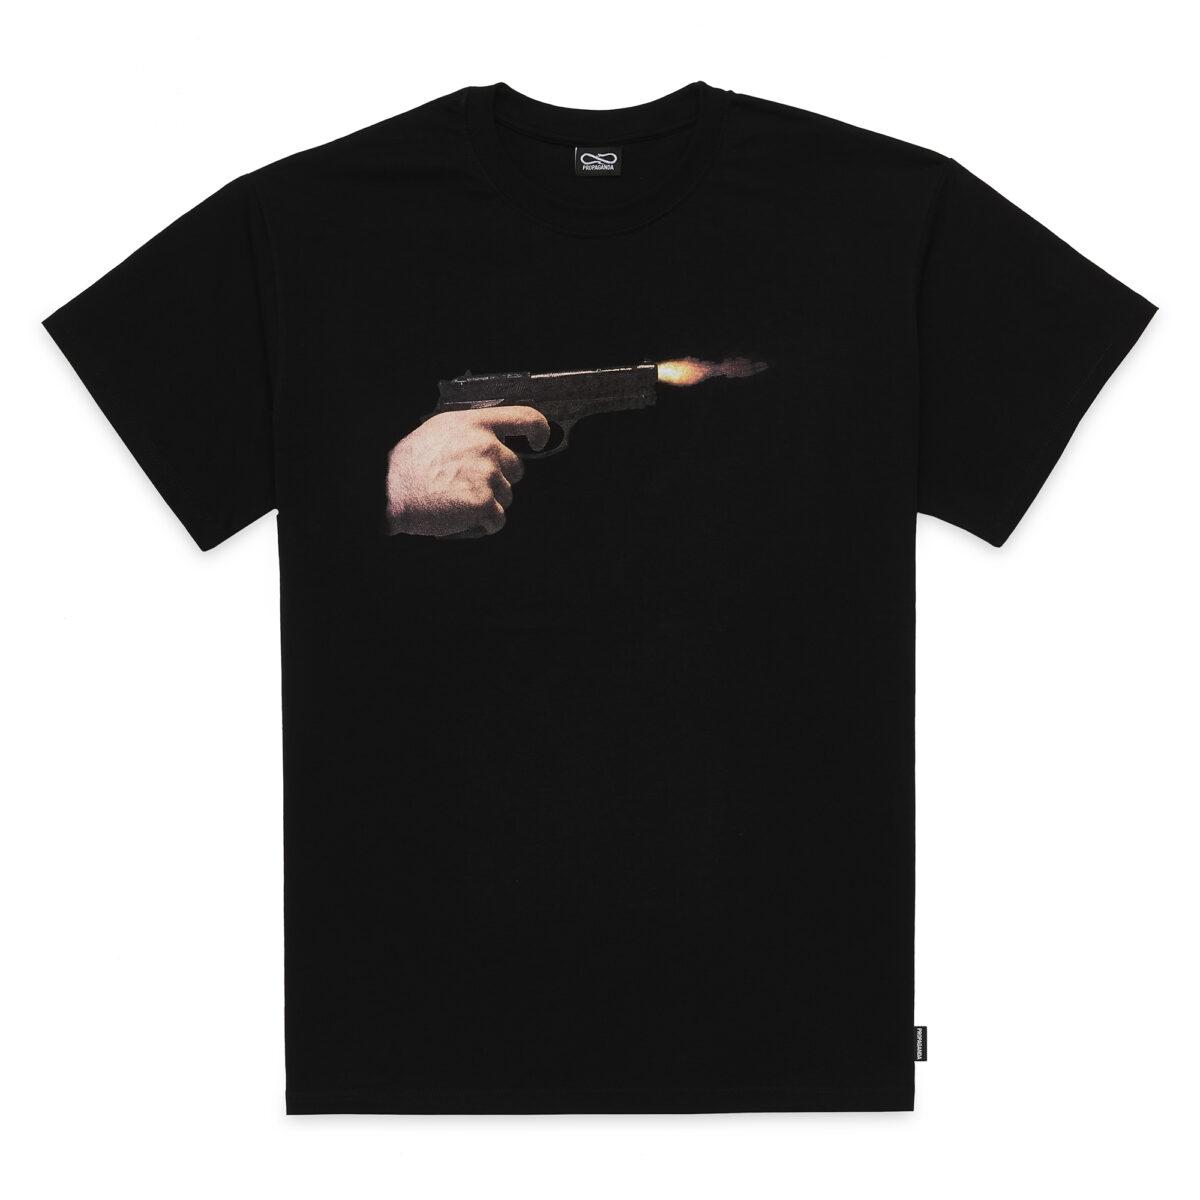 T-shirt Propaganda - GUN Tee SS21 Black